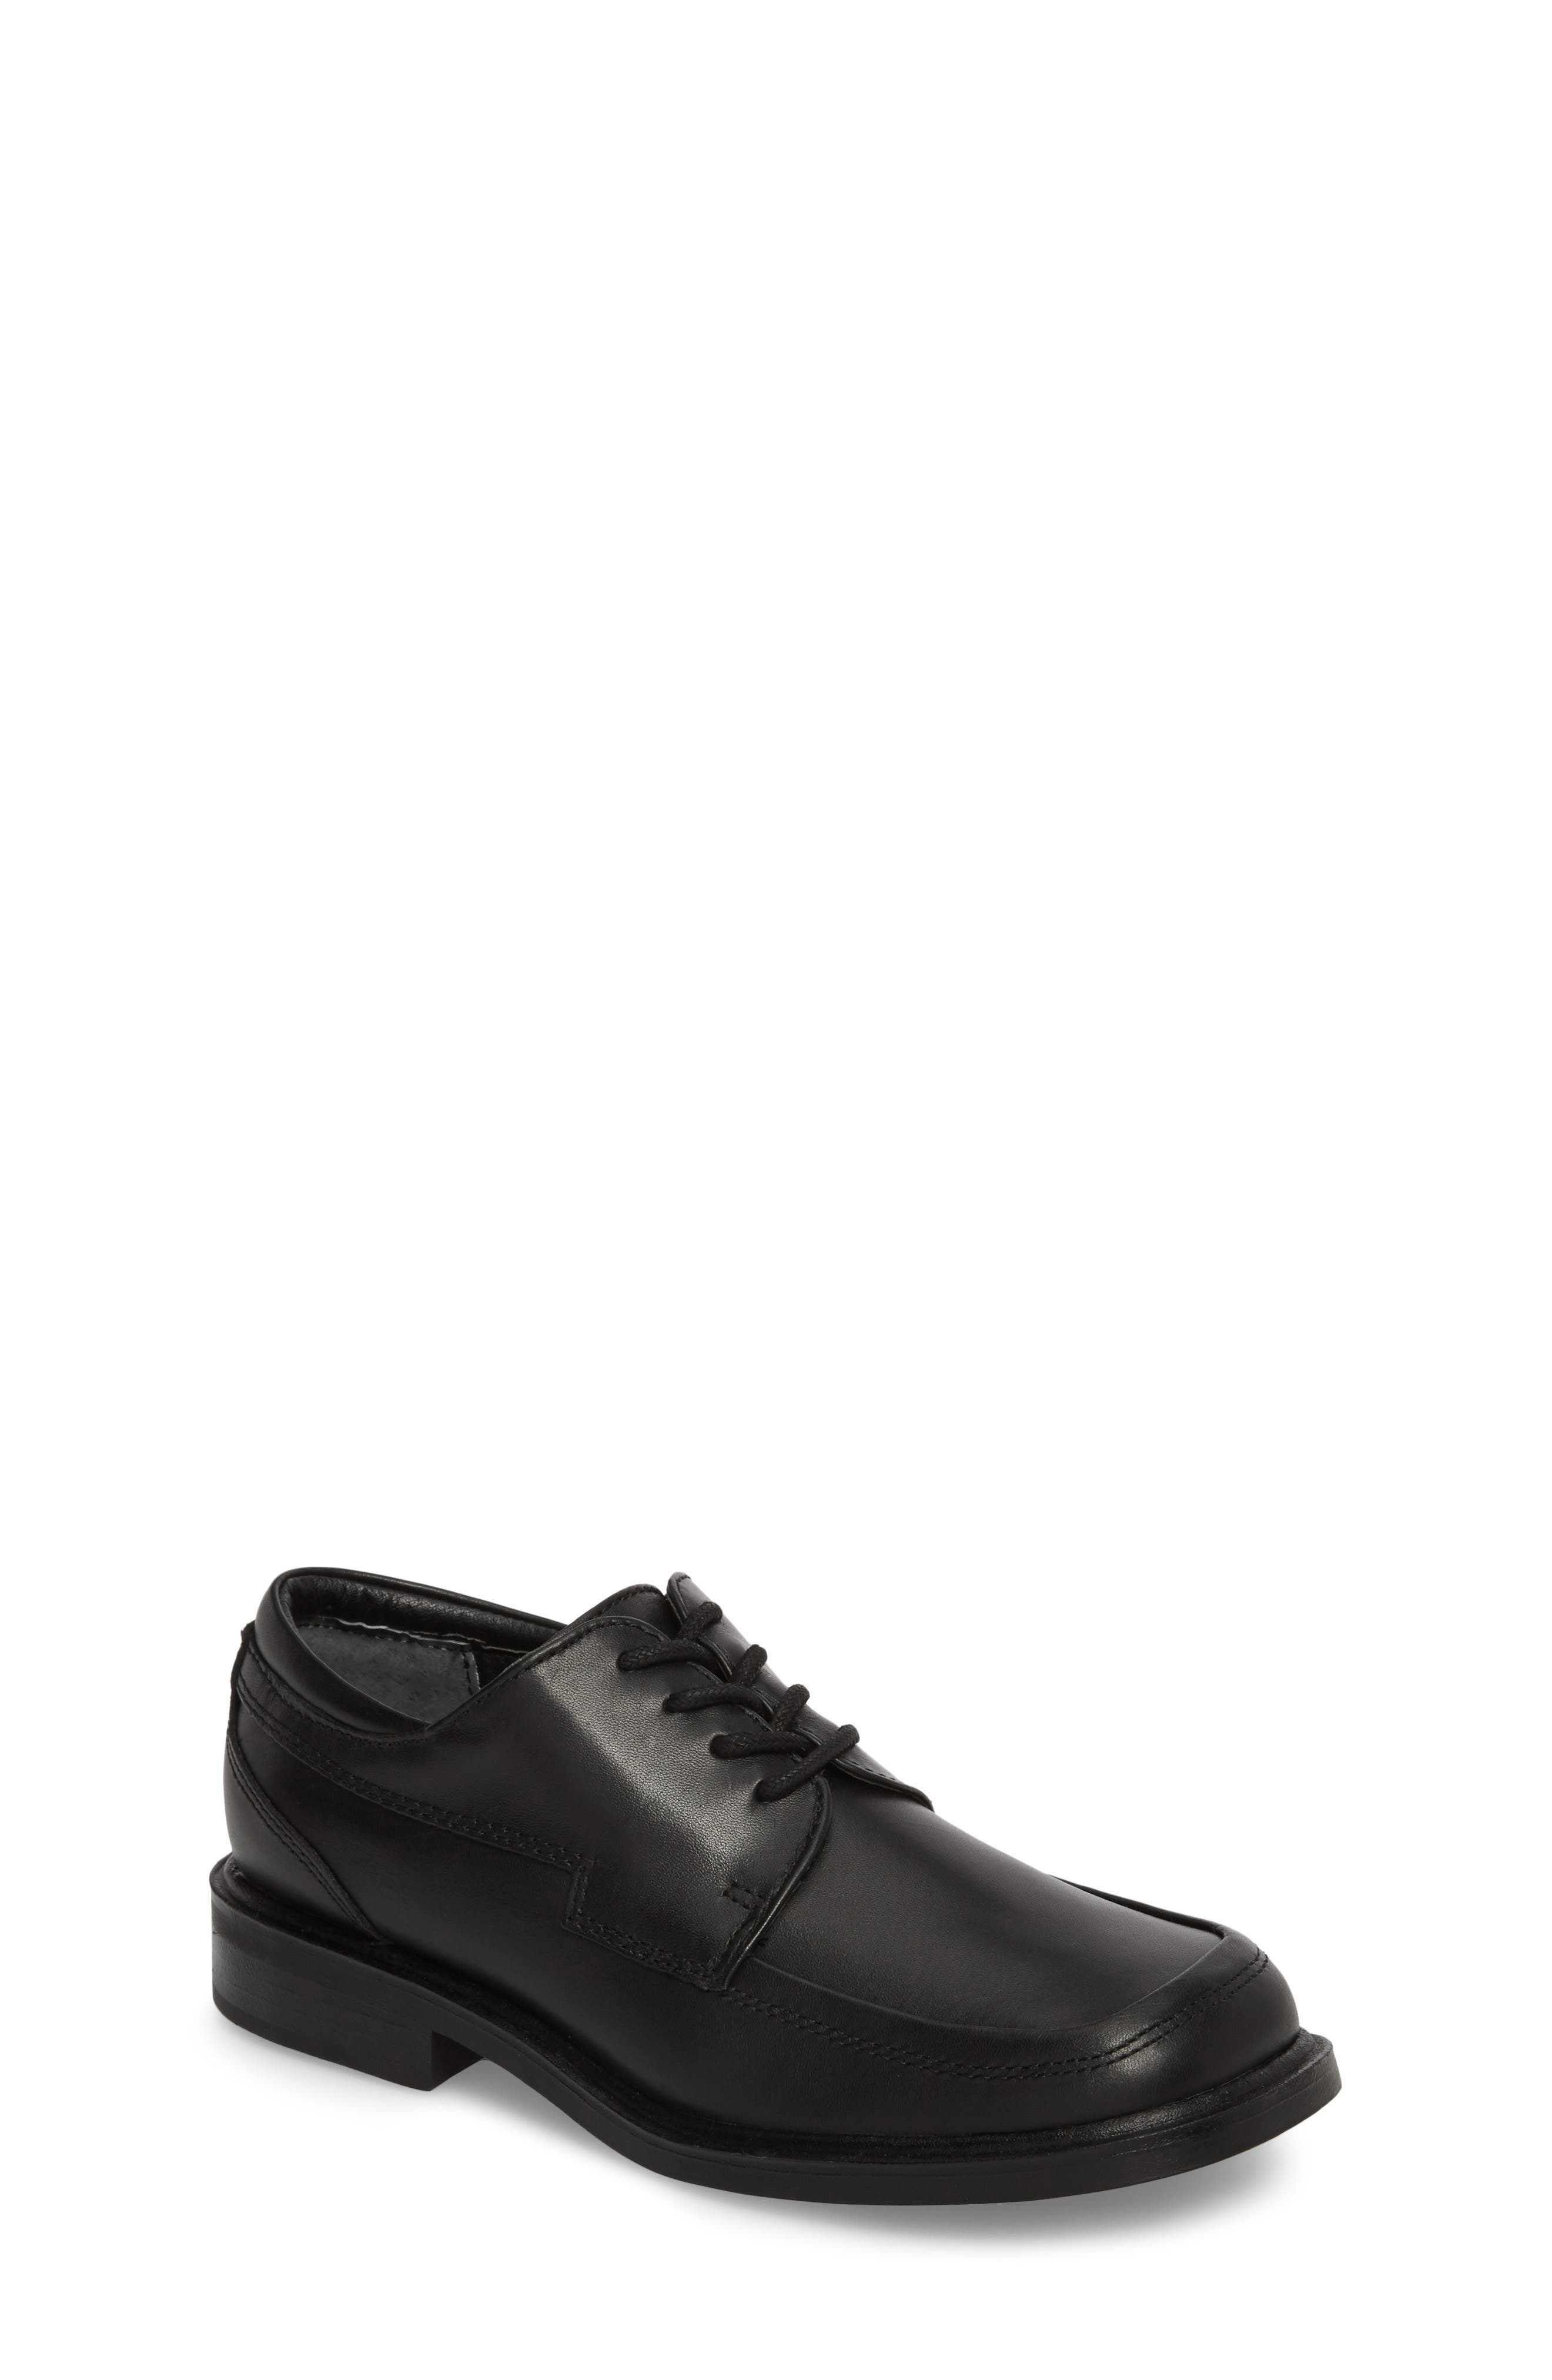 Reaction Kenneth Cole 'T-Flex Senior' Oxford,                         Main,                         color, Black/ Black Leather